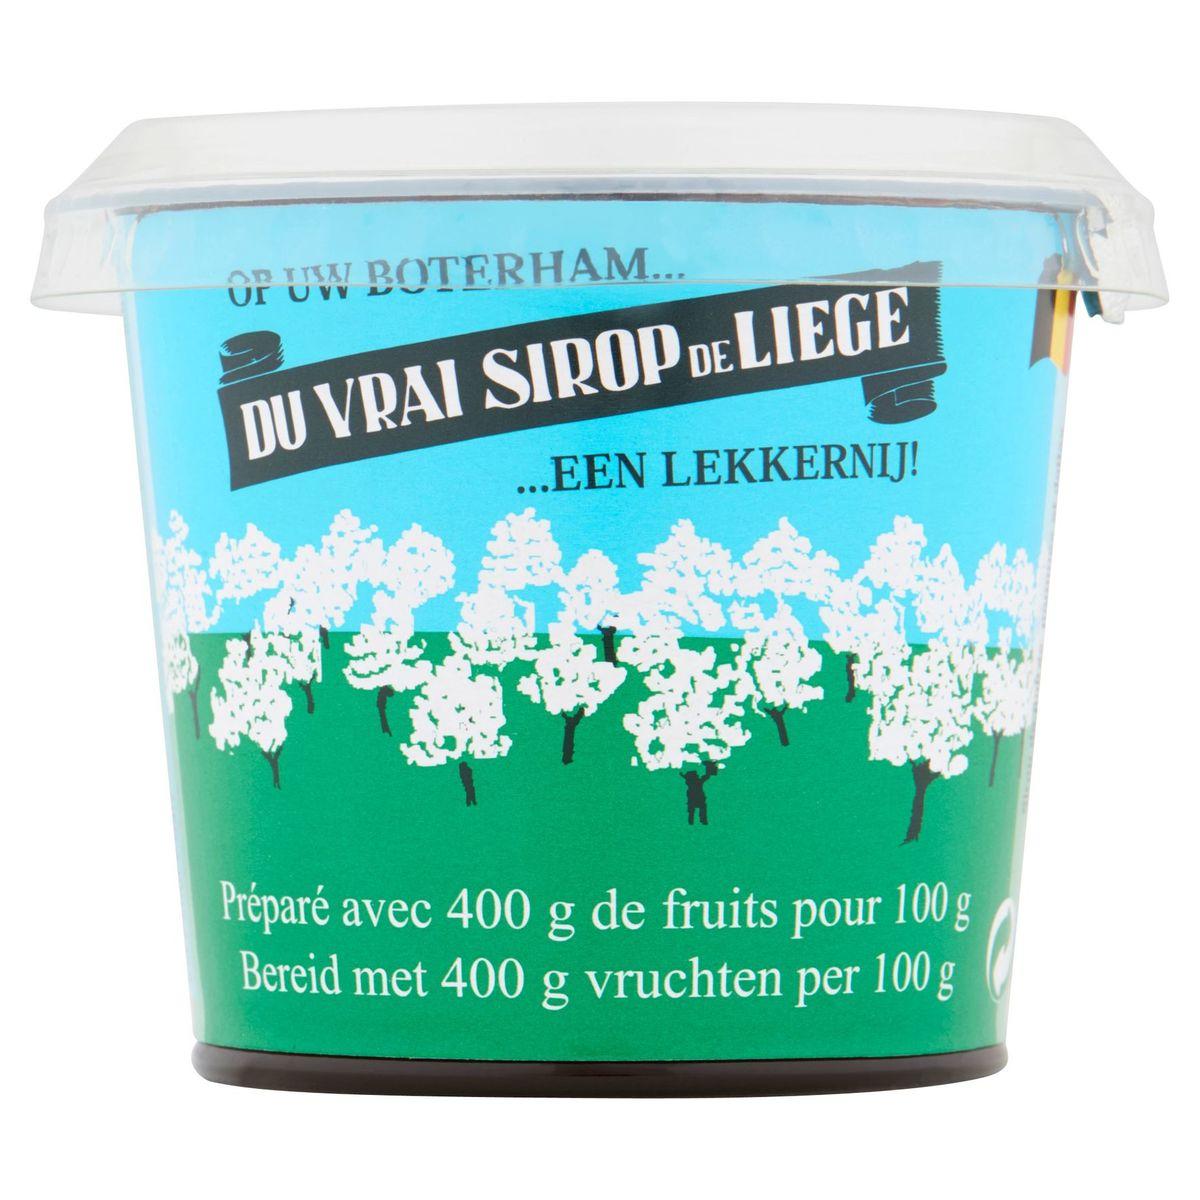 Du Vrai Sirop de Liège 80 g